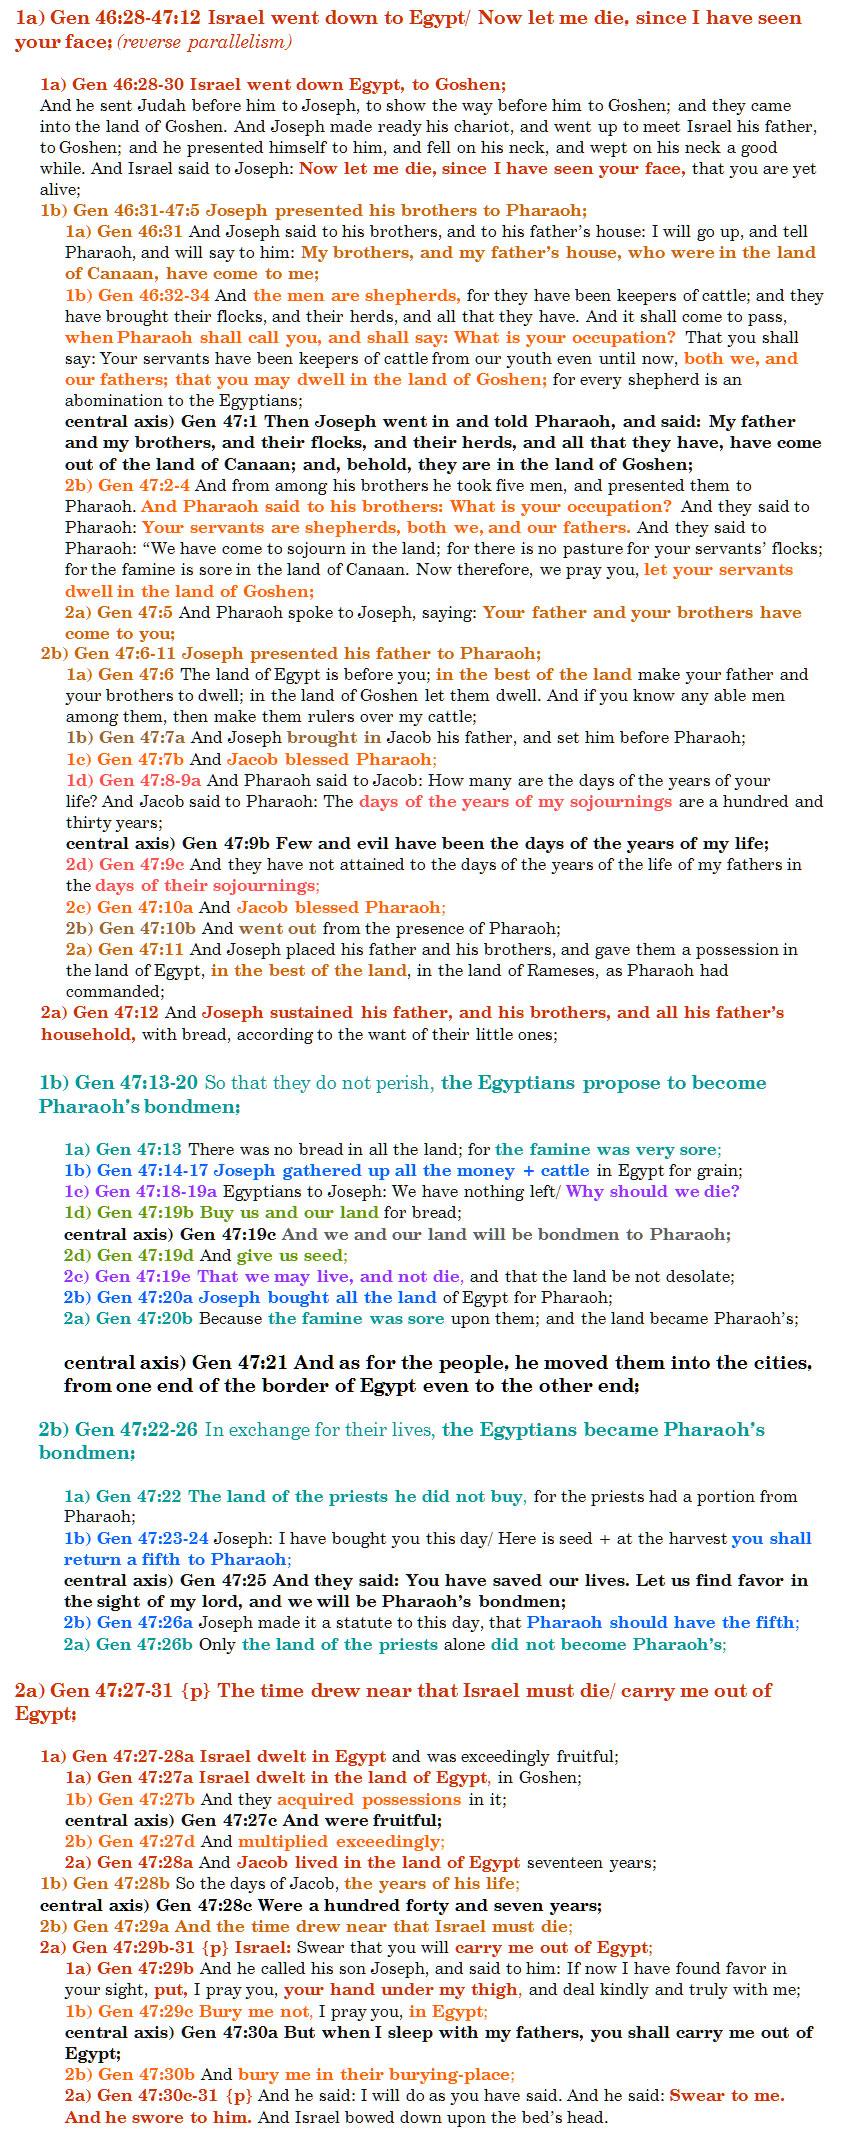 Gen 46:28-47:31 chiasm | christine's bible study at alittleperspective.com